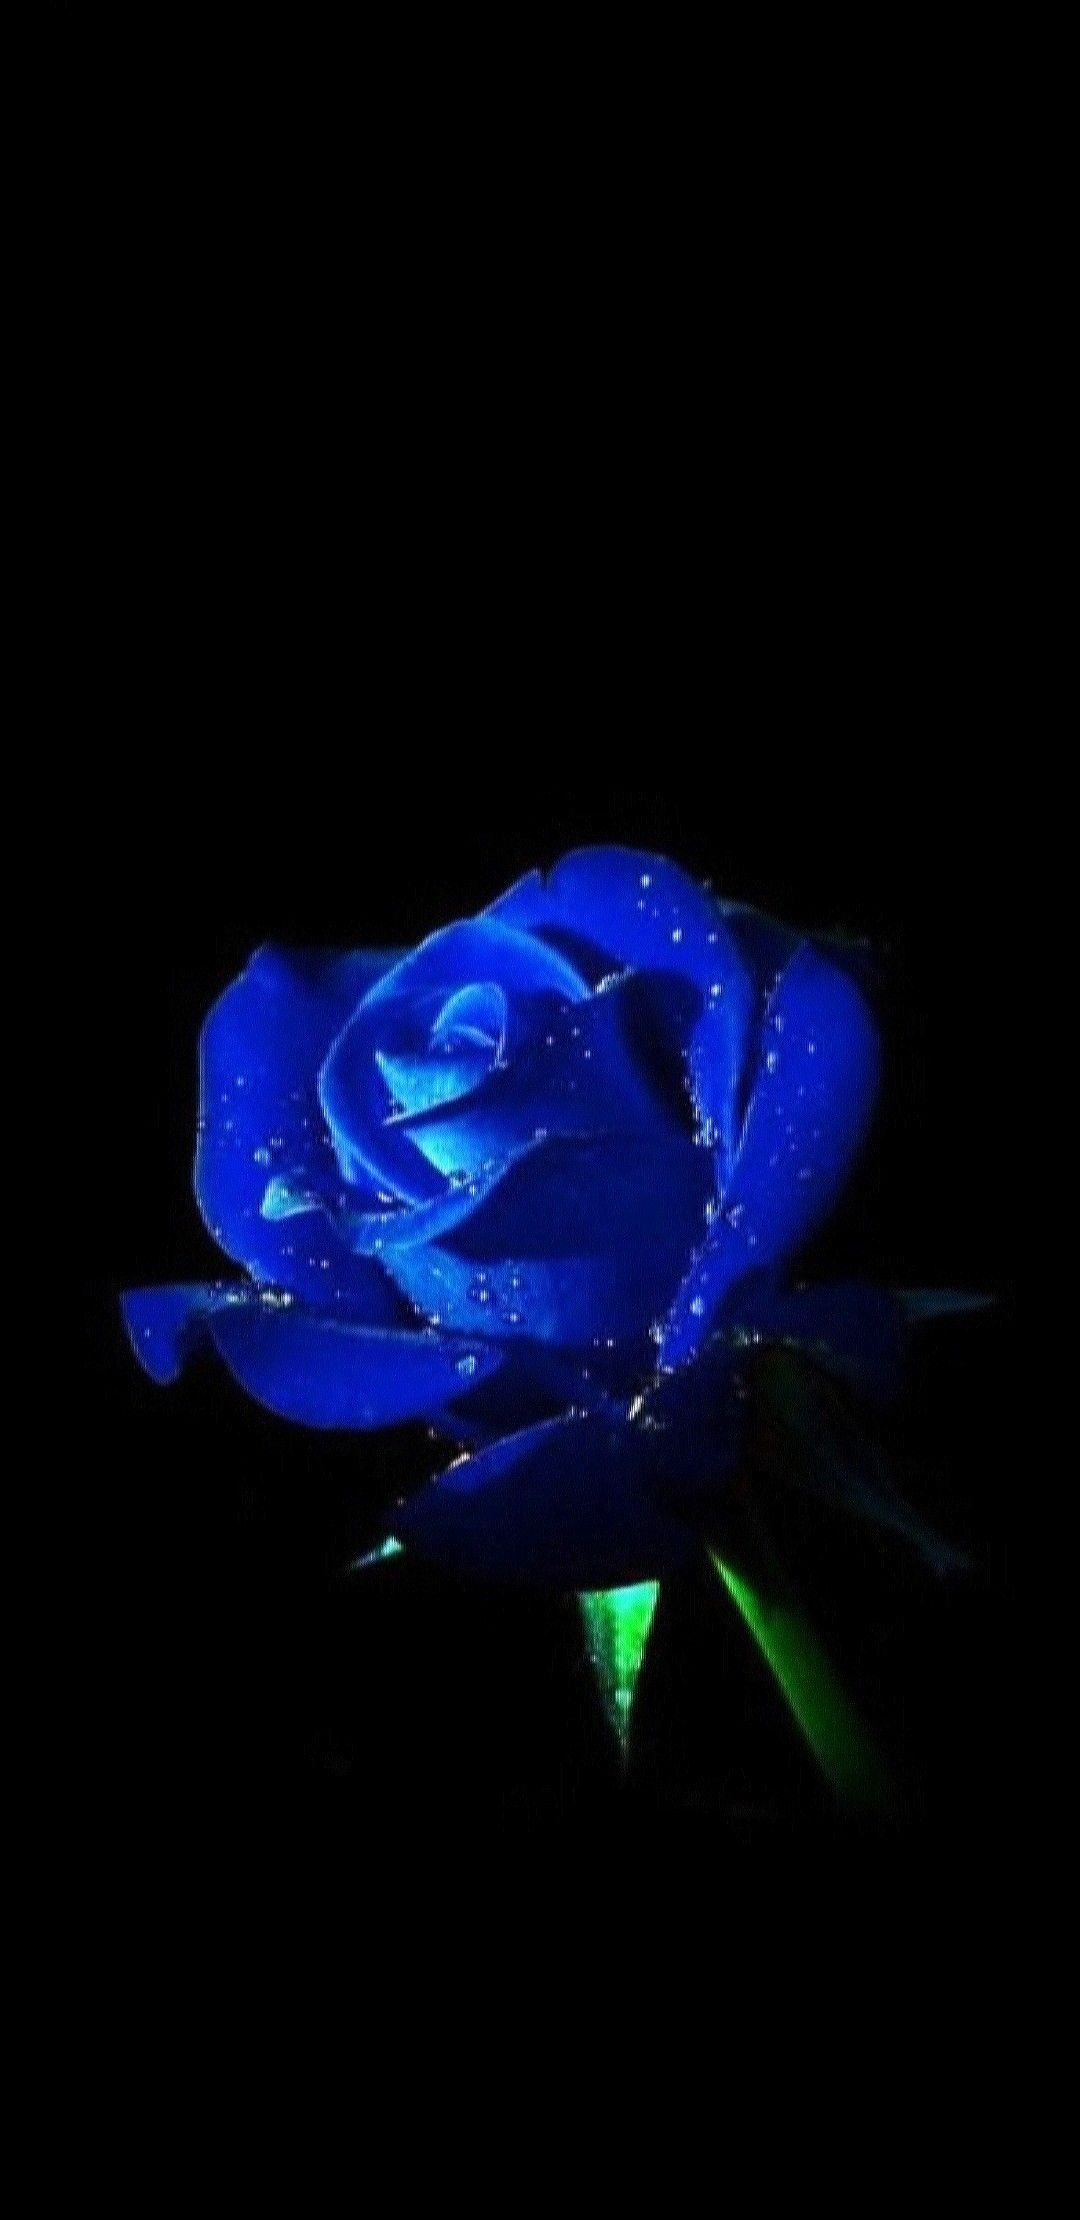 Pin By Naomi Wharton On Fractal Art Valentines Wallpaper Blue Roses Rose Wallpaper